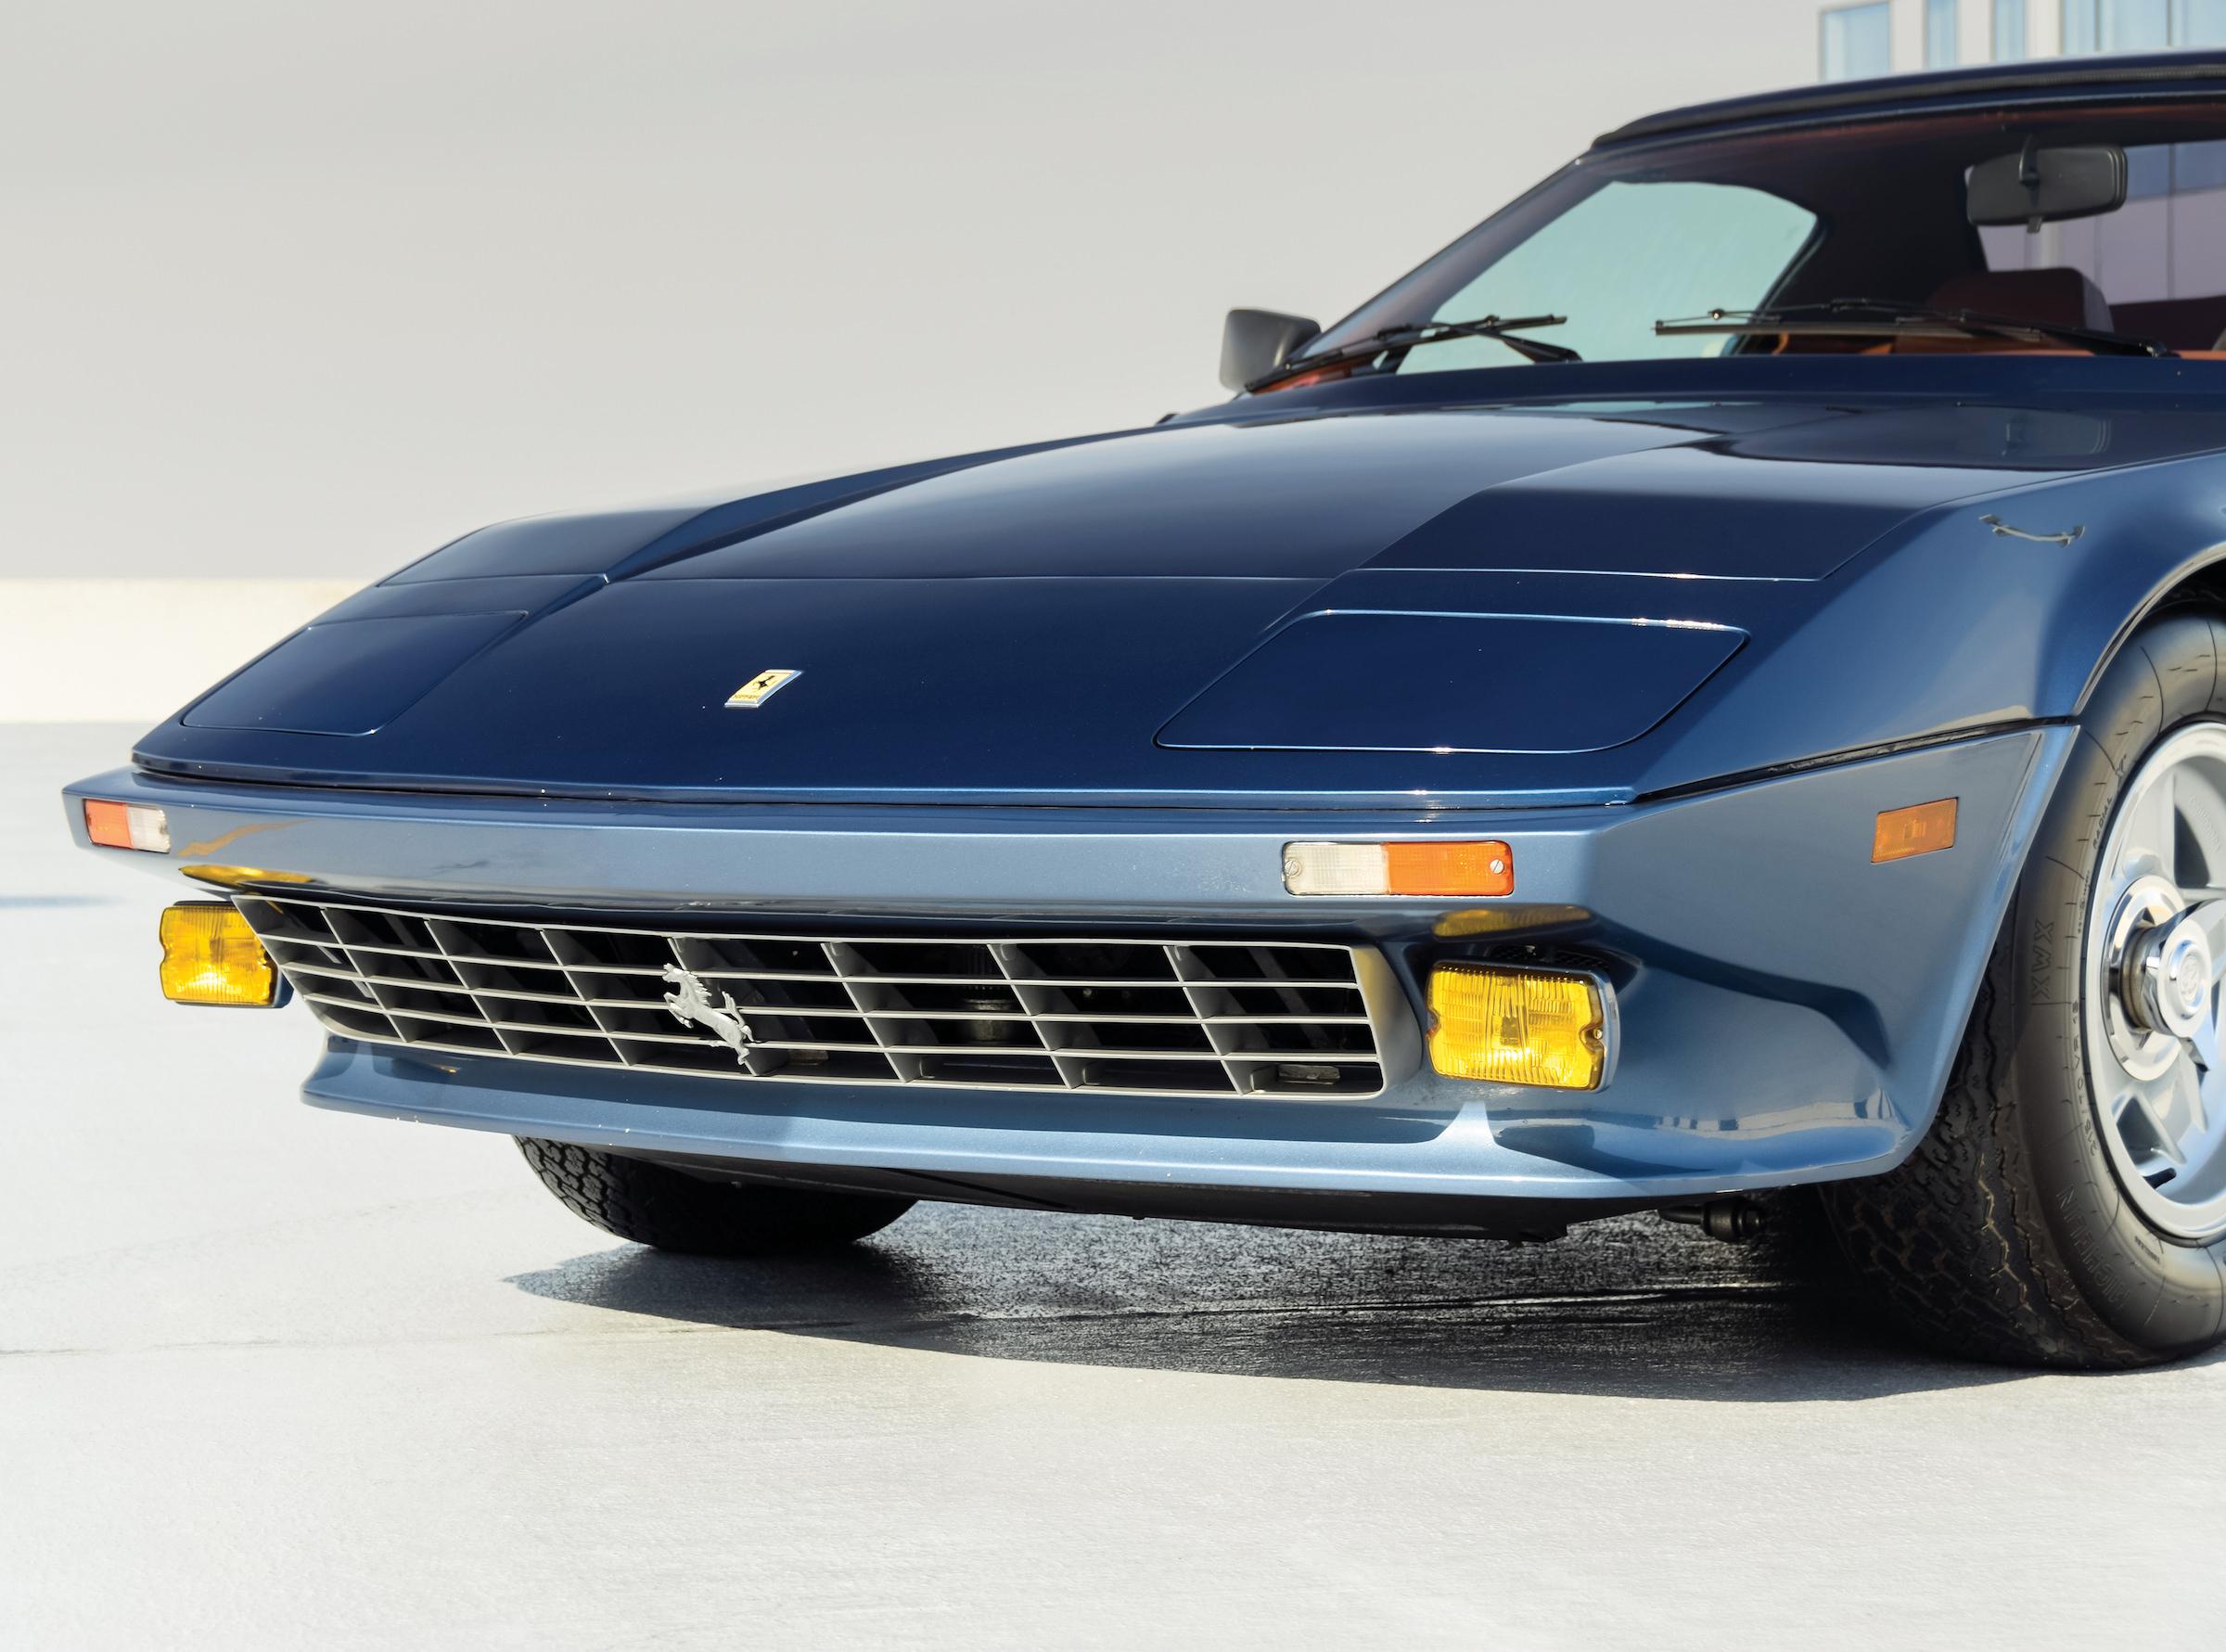 Ferrari 365 GTB/4 Daytona Spider N.A.R.T. - NARTisanat Italo-Américain... 34